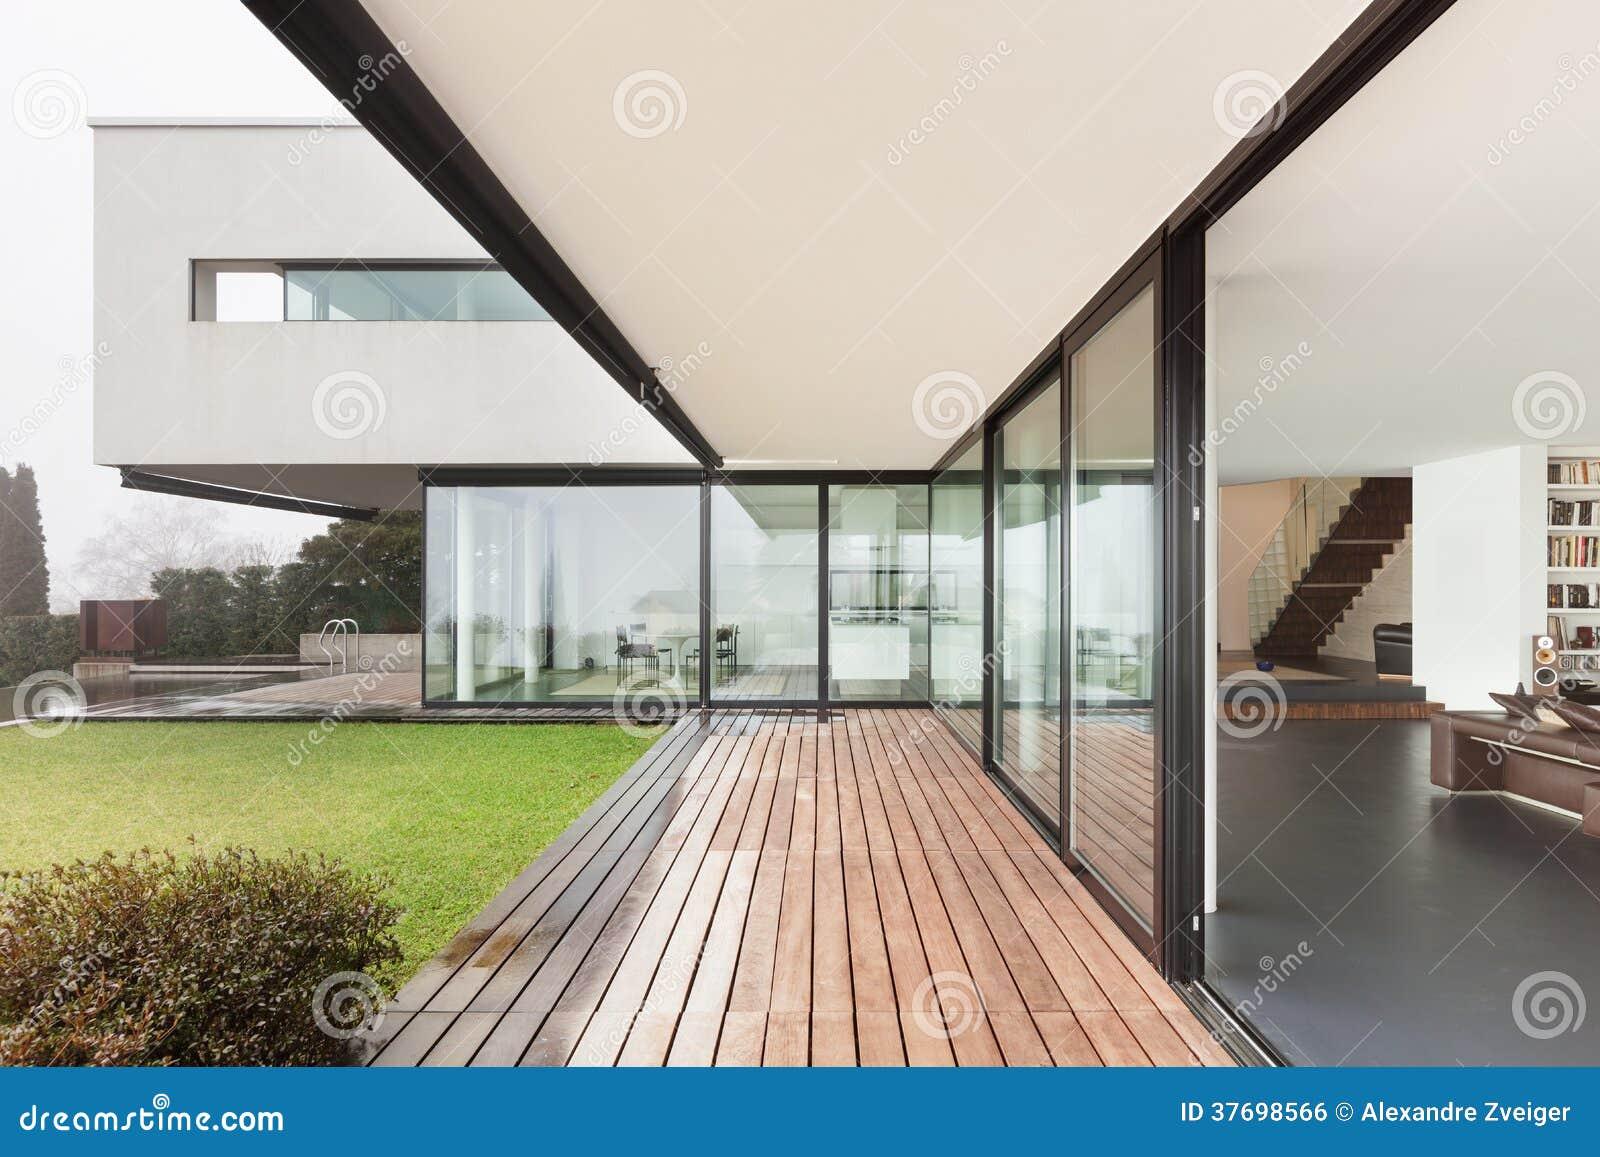 Arquitectura, interior hermoso de un chalet moderno